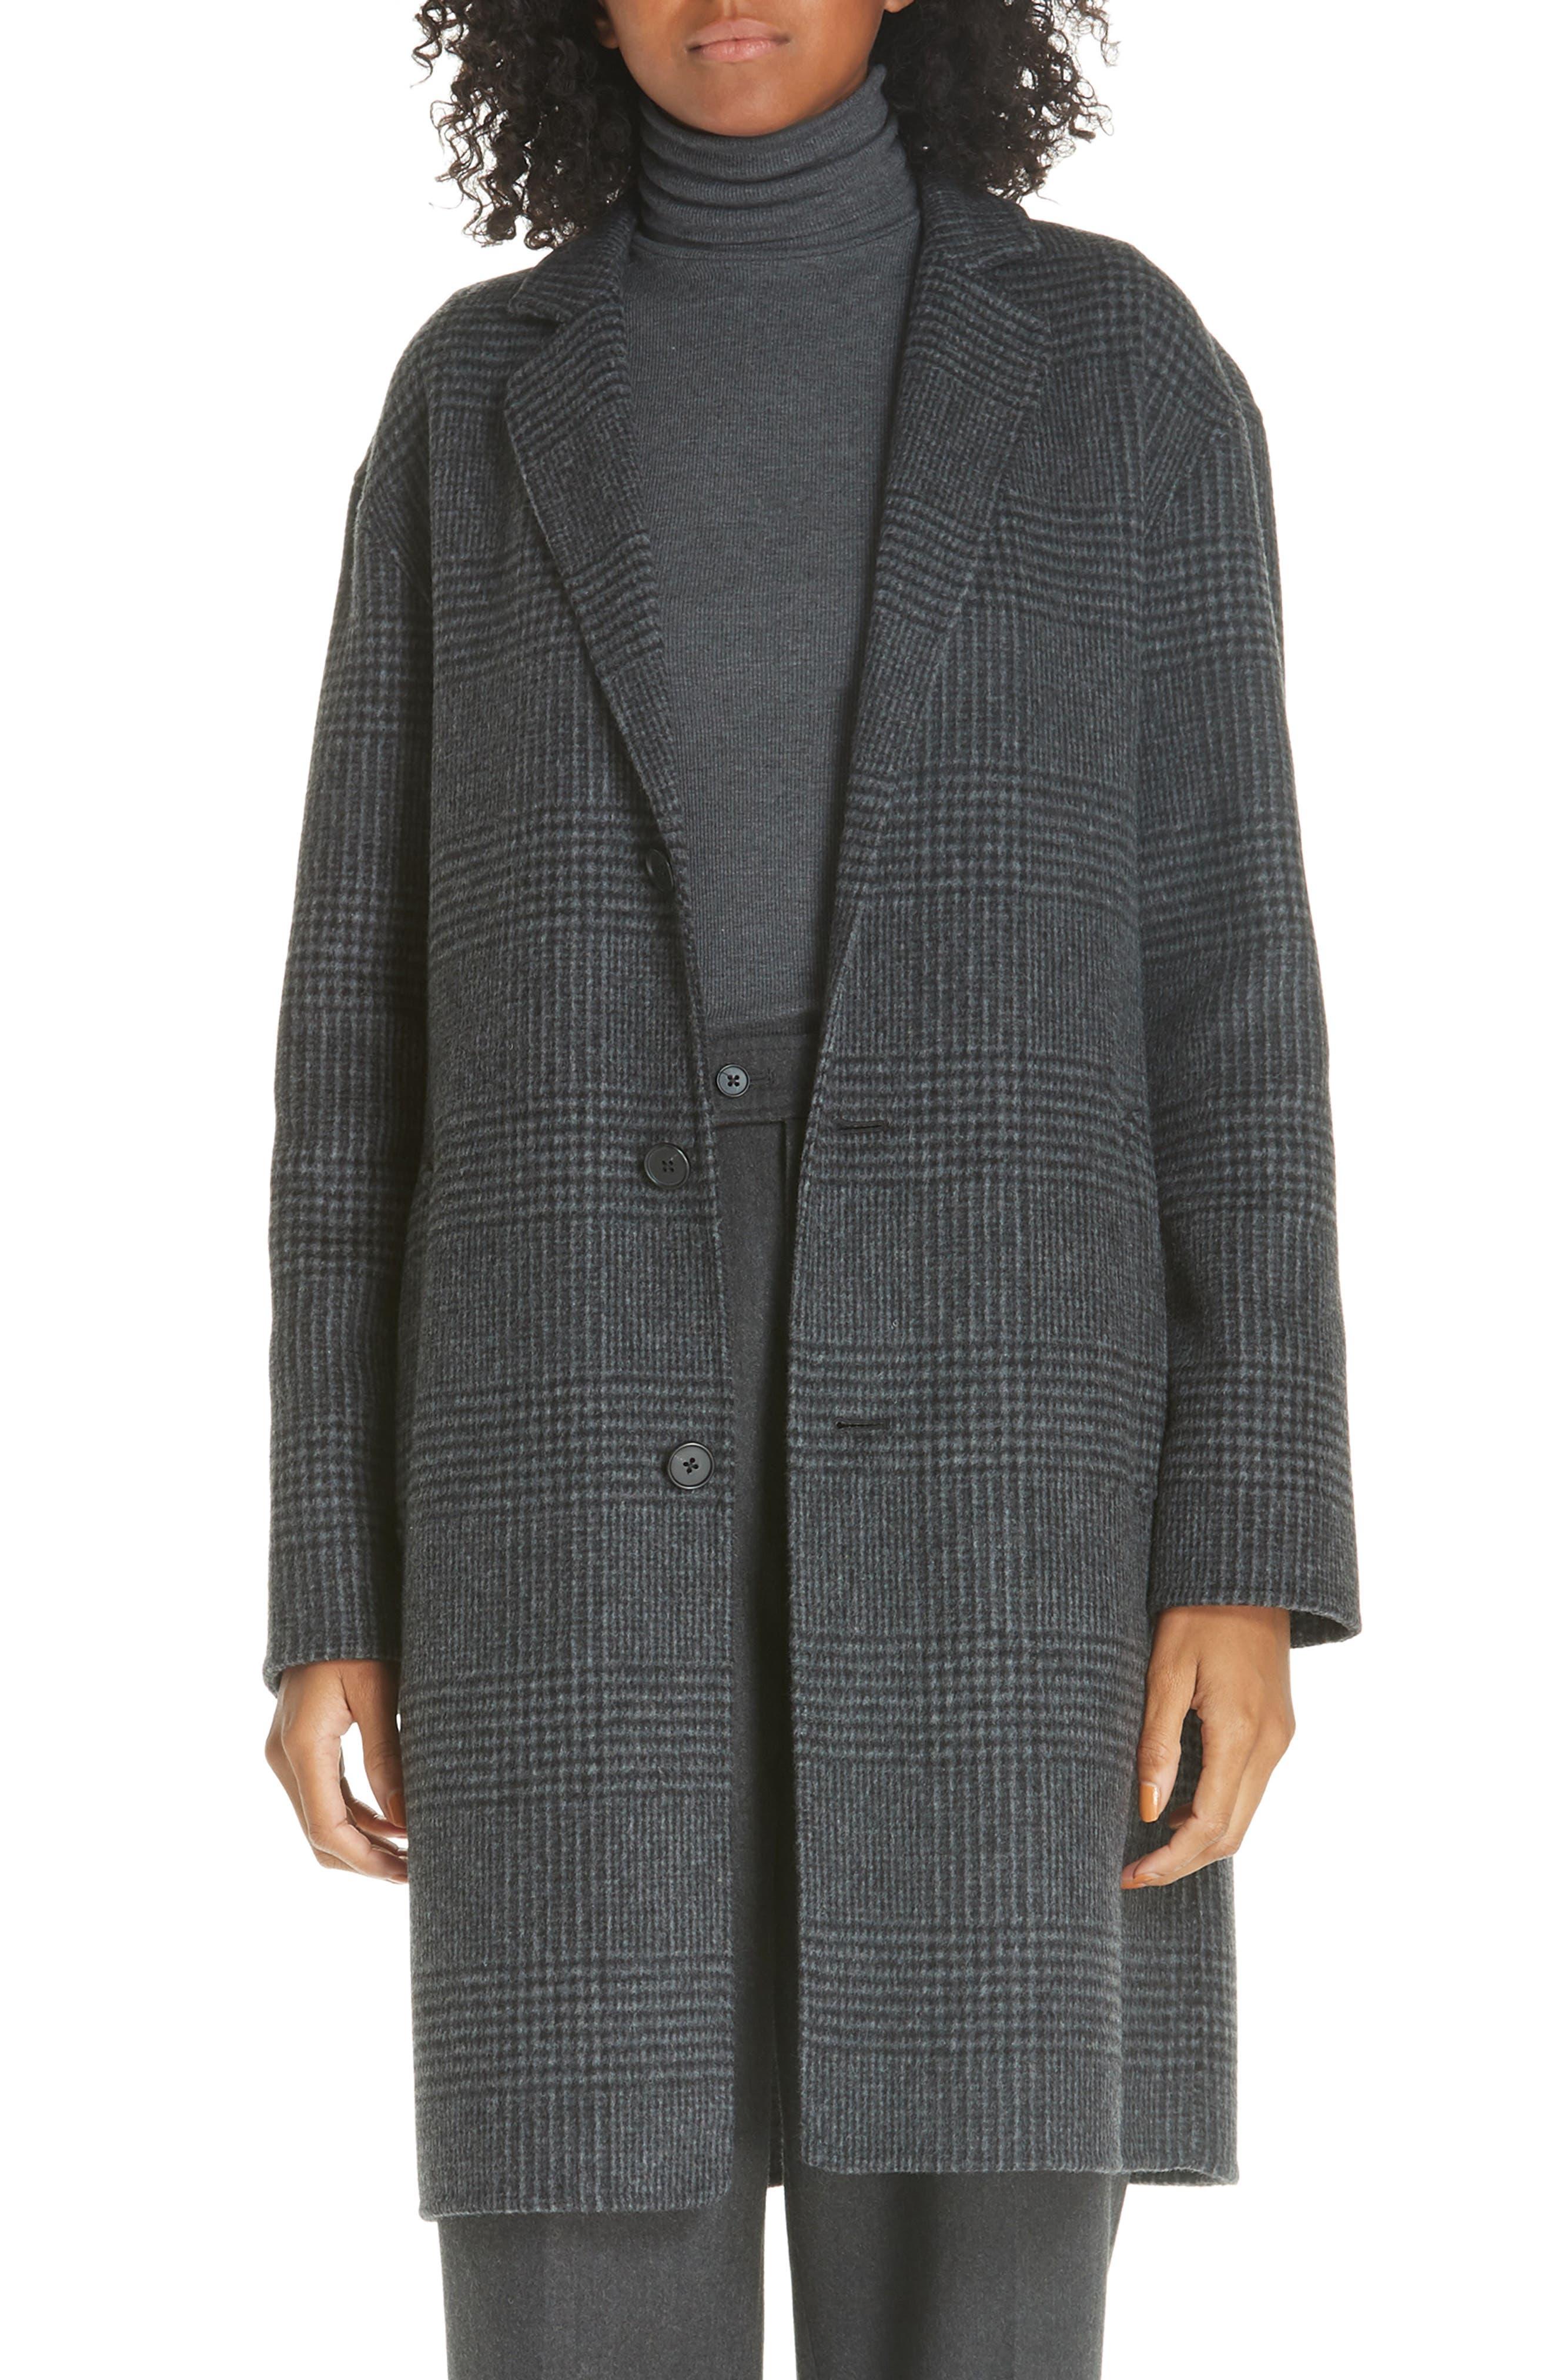 Plaid Wool Blend Coat,                             Main thumbnail 1, color,                             CHARCOAL GLEN PLAID